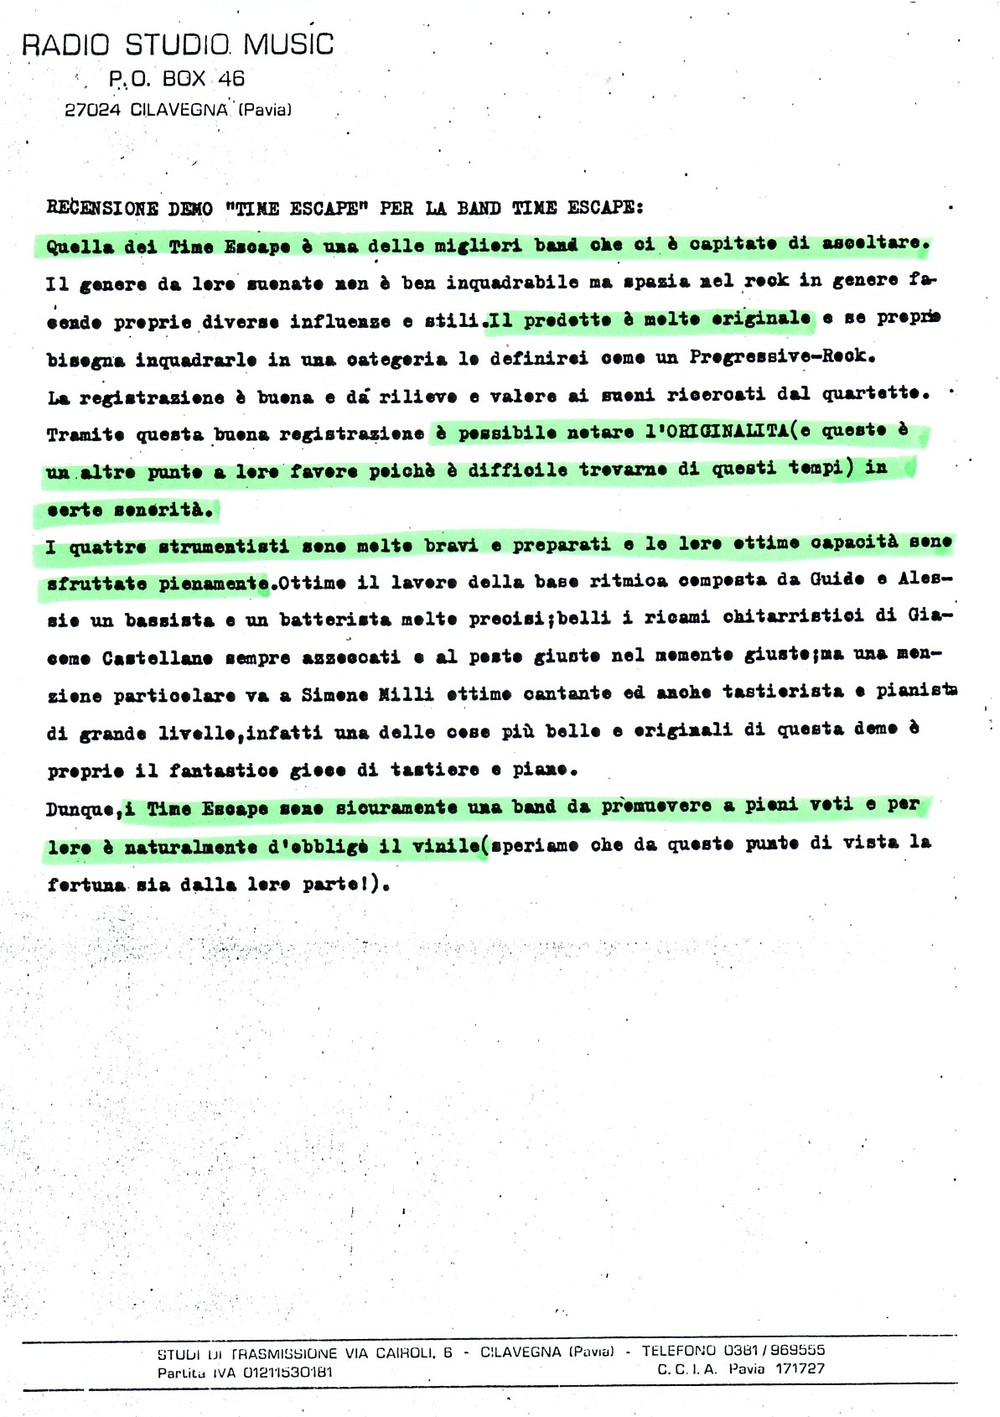 RADIO STUDIO MUSIC (ITALY) - 1988